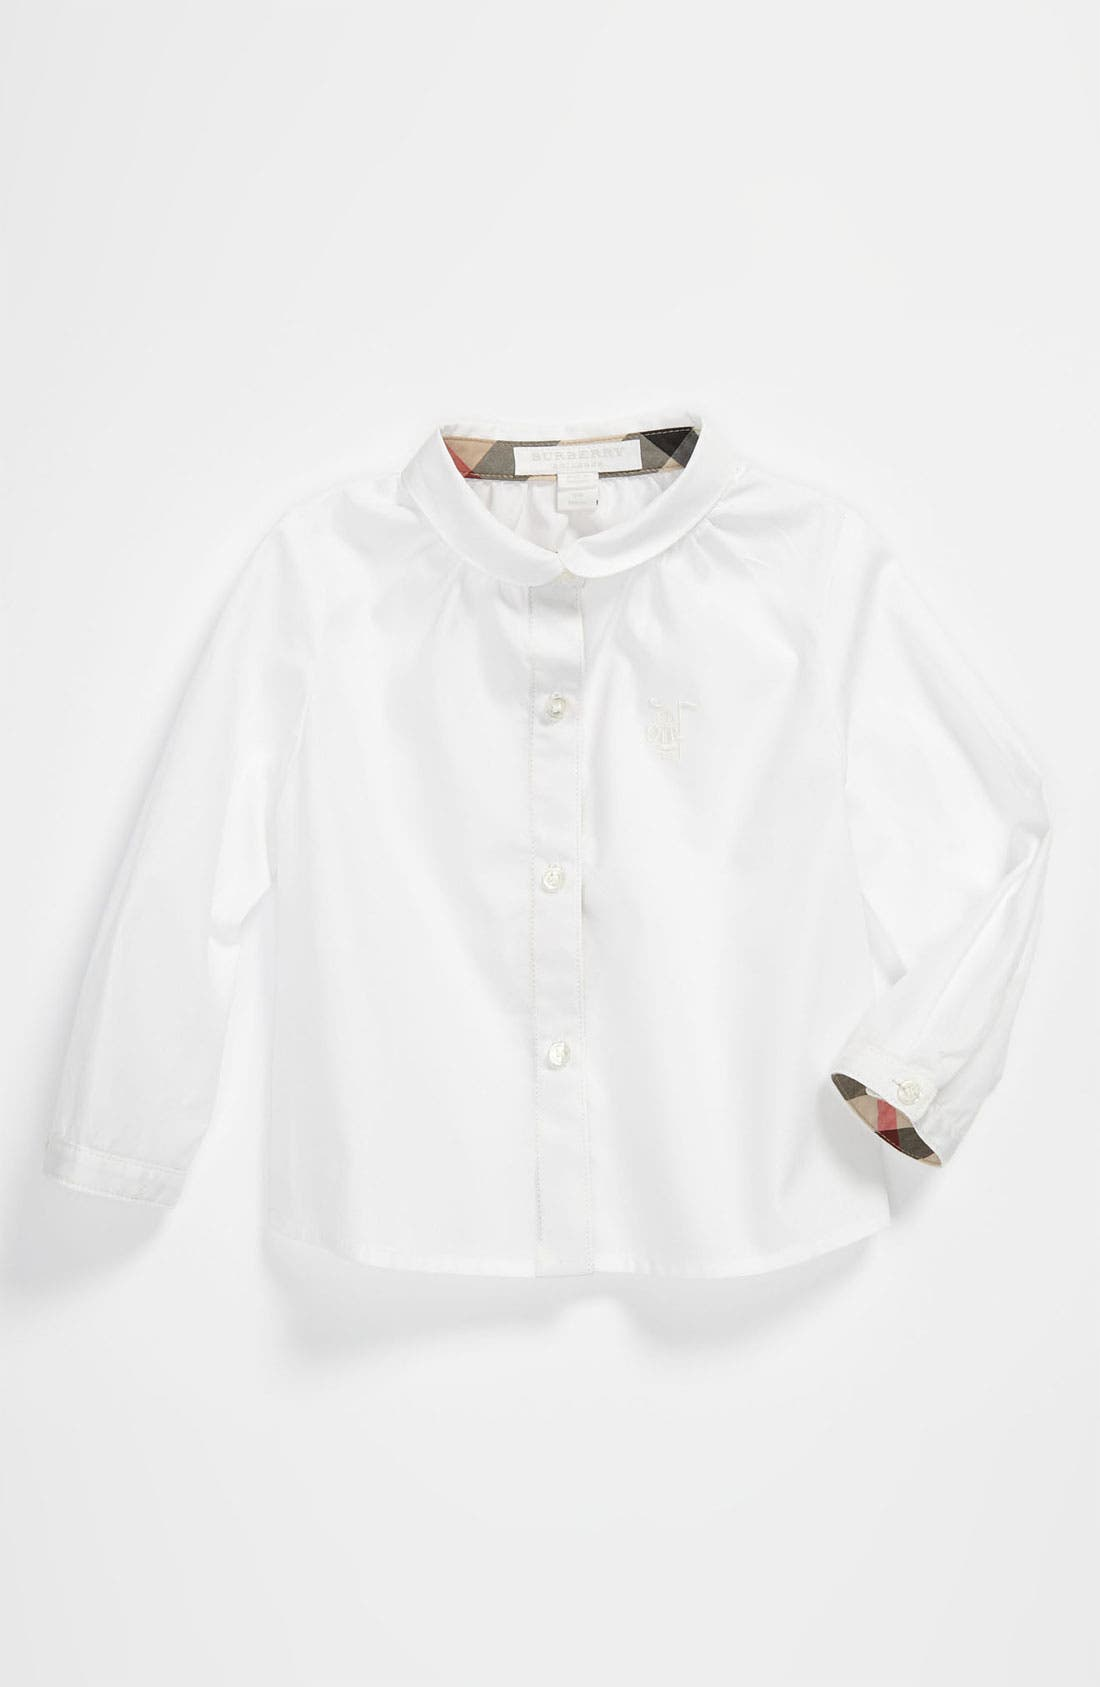 Main Image - Burberry Woven Shirt (Toddler)